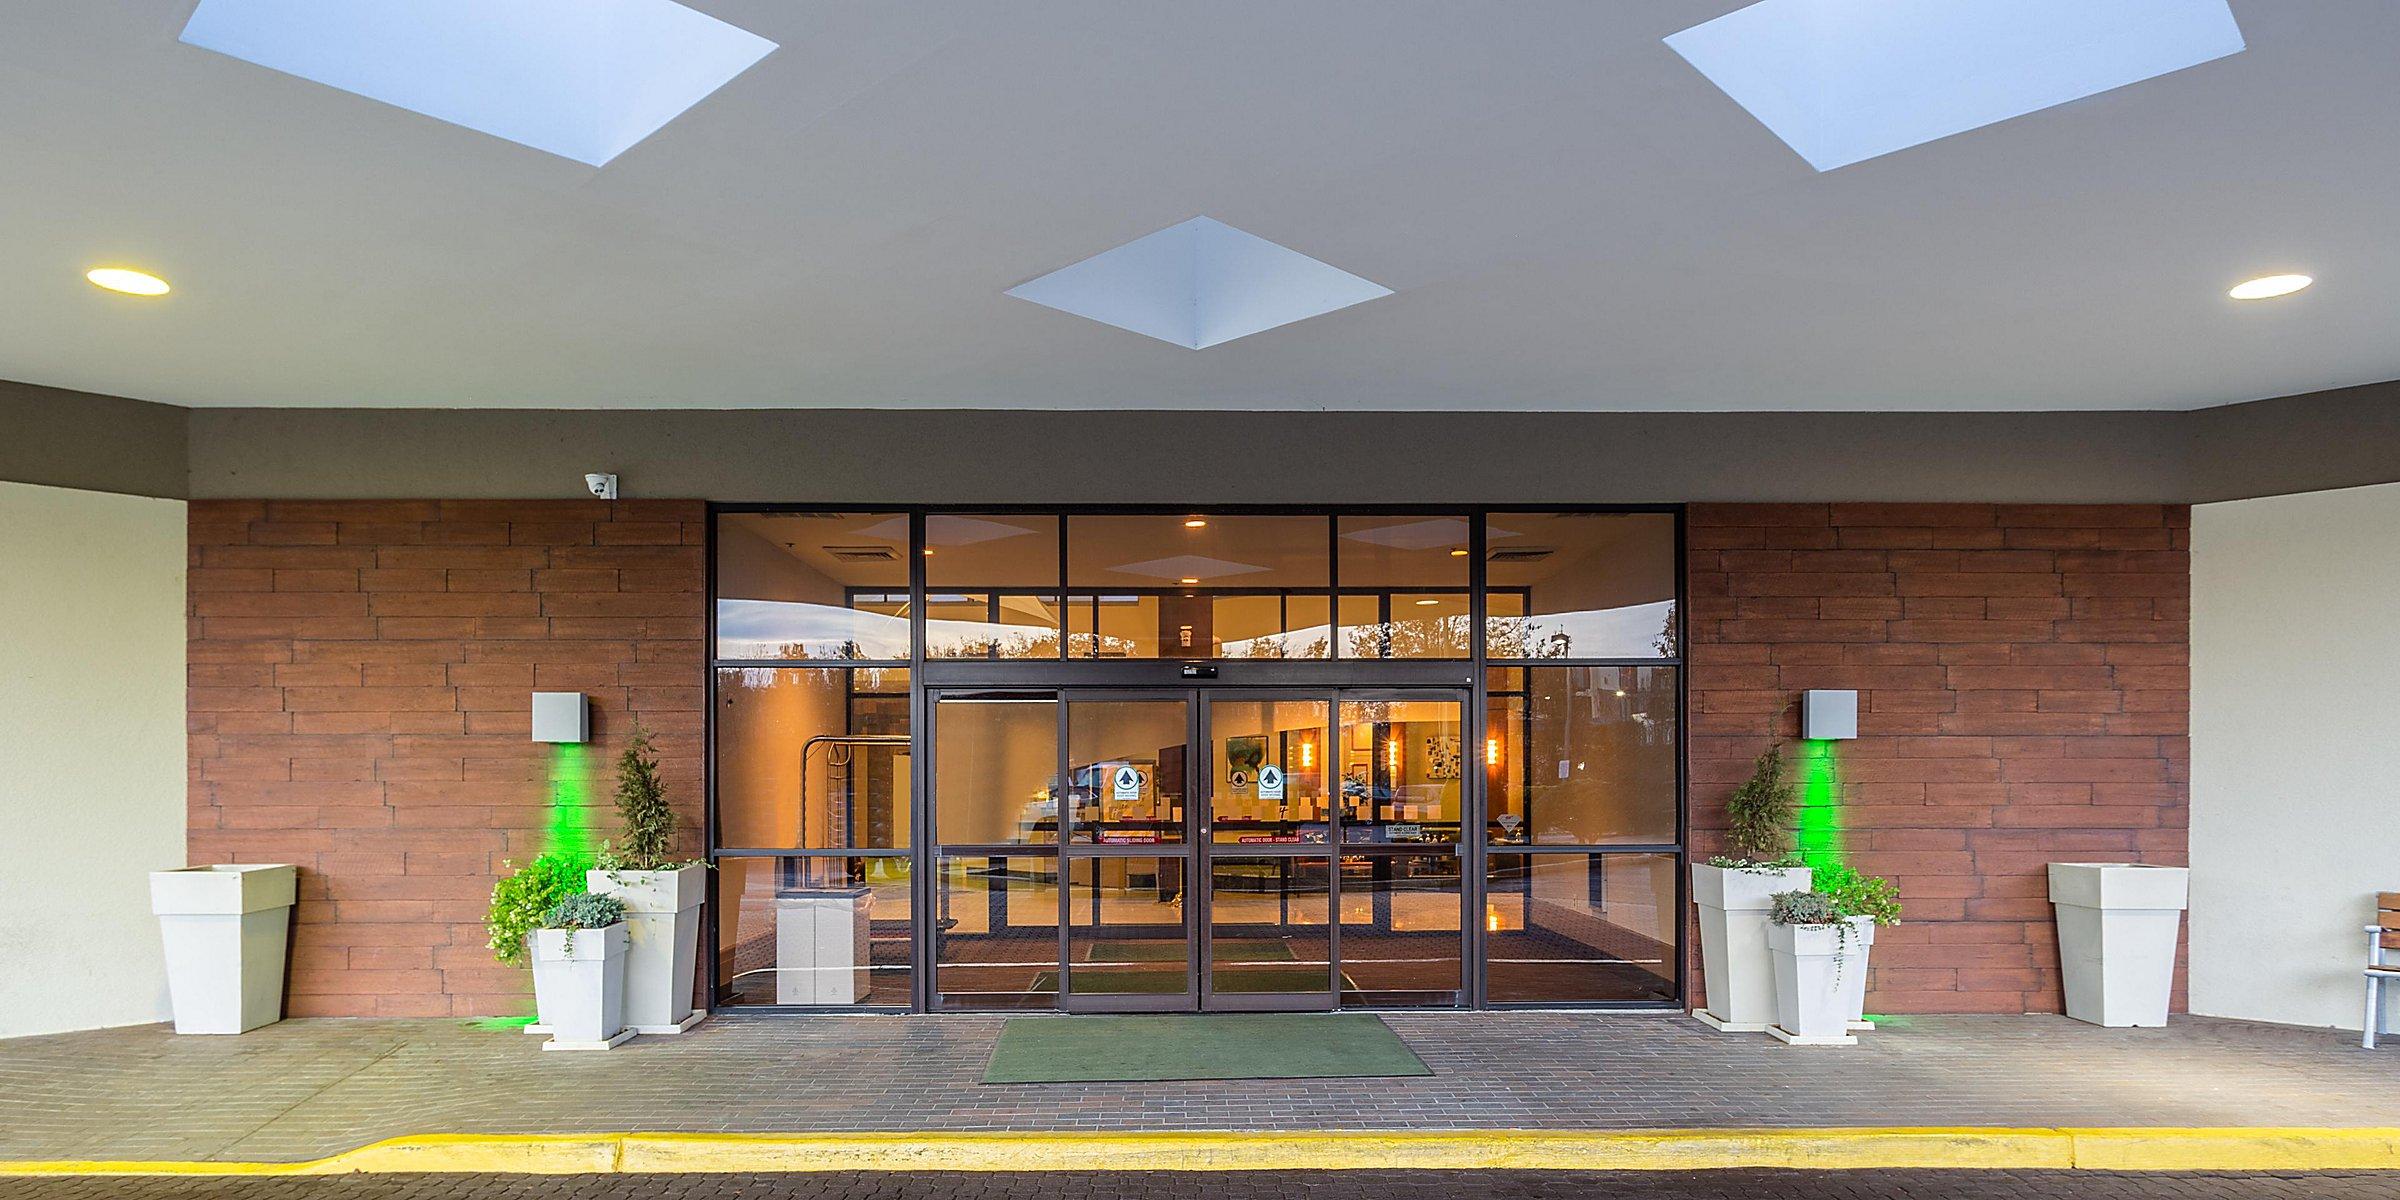 Pet Friendly Hotels In Swedesboro Nj Holiday Inn Philadelphia South Swedesboro